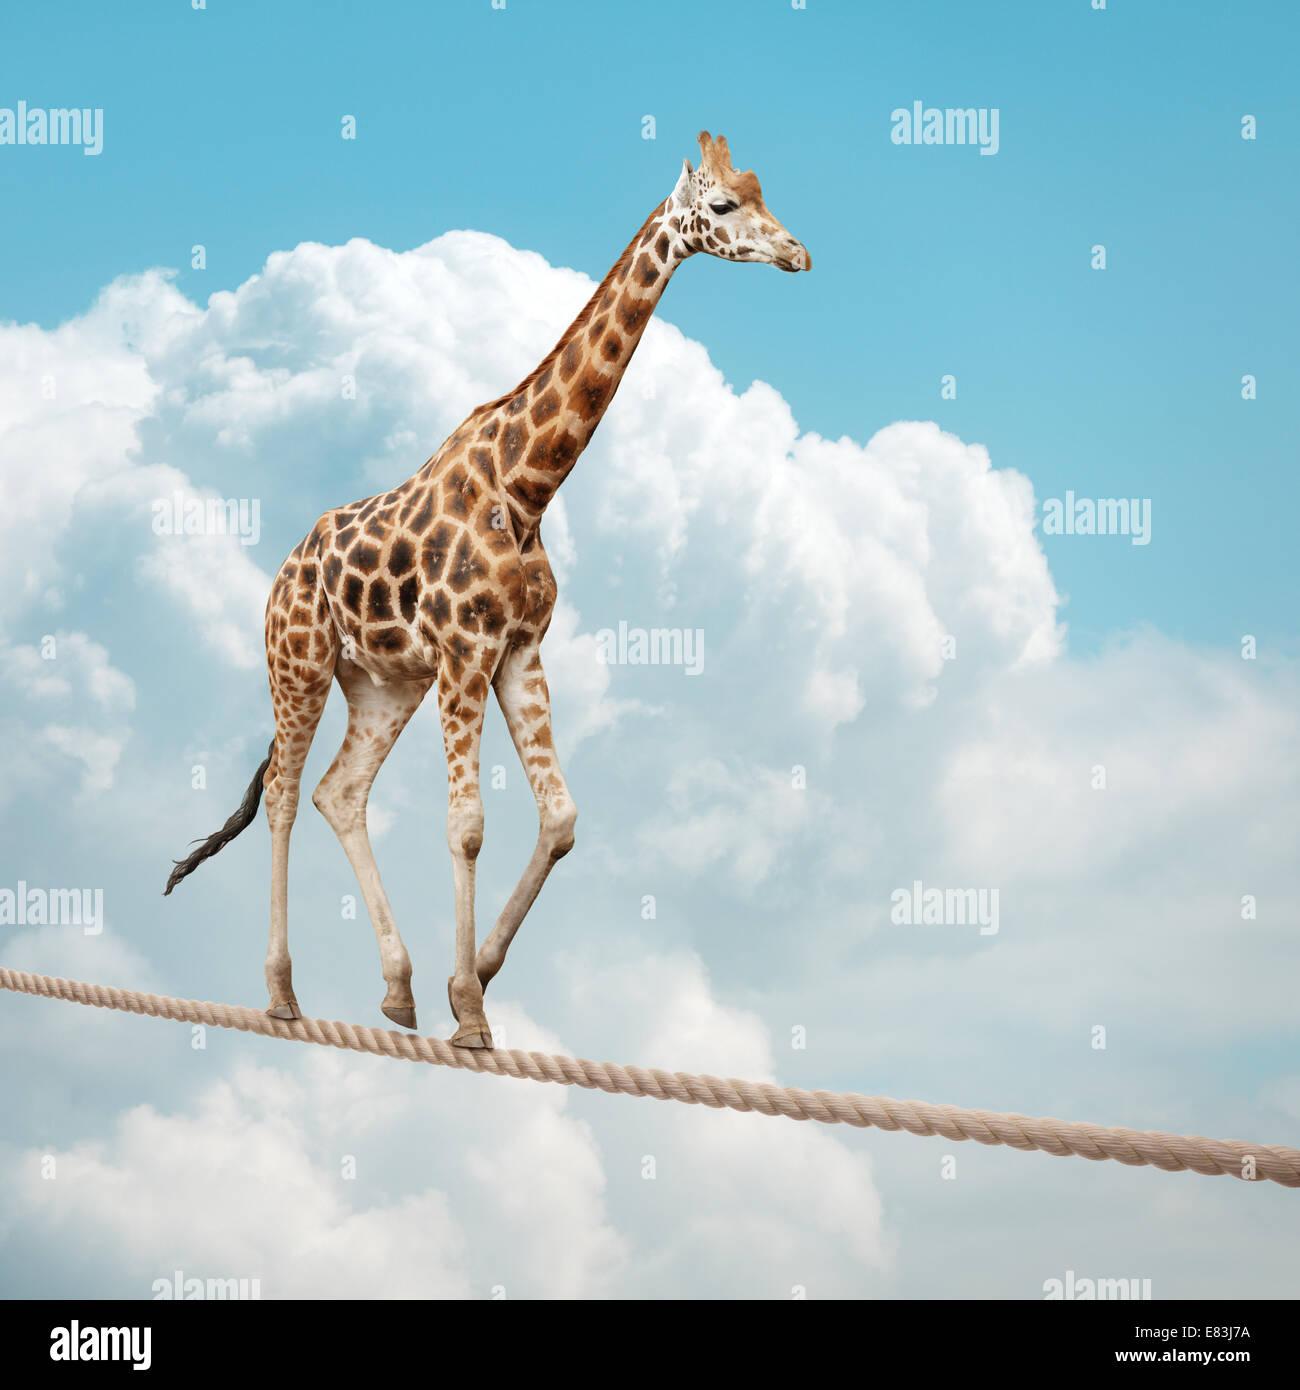 Giraffe balancing on a tightrope - Stock Image